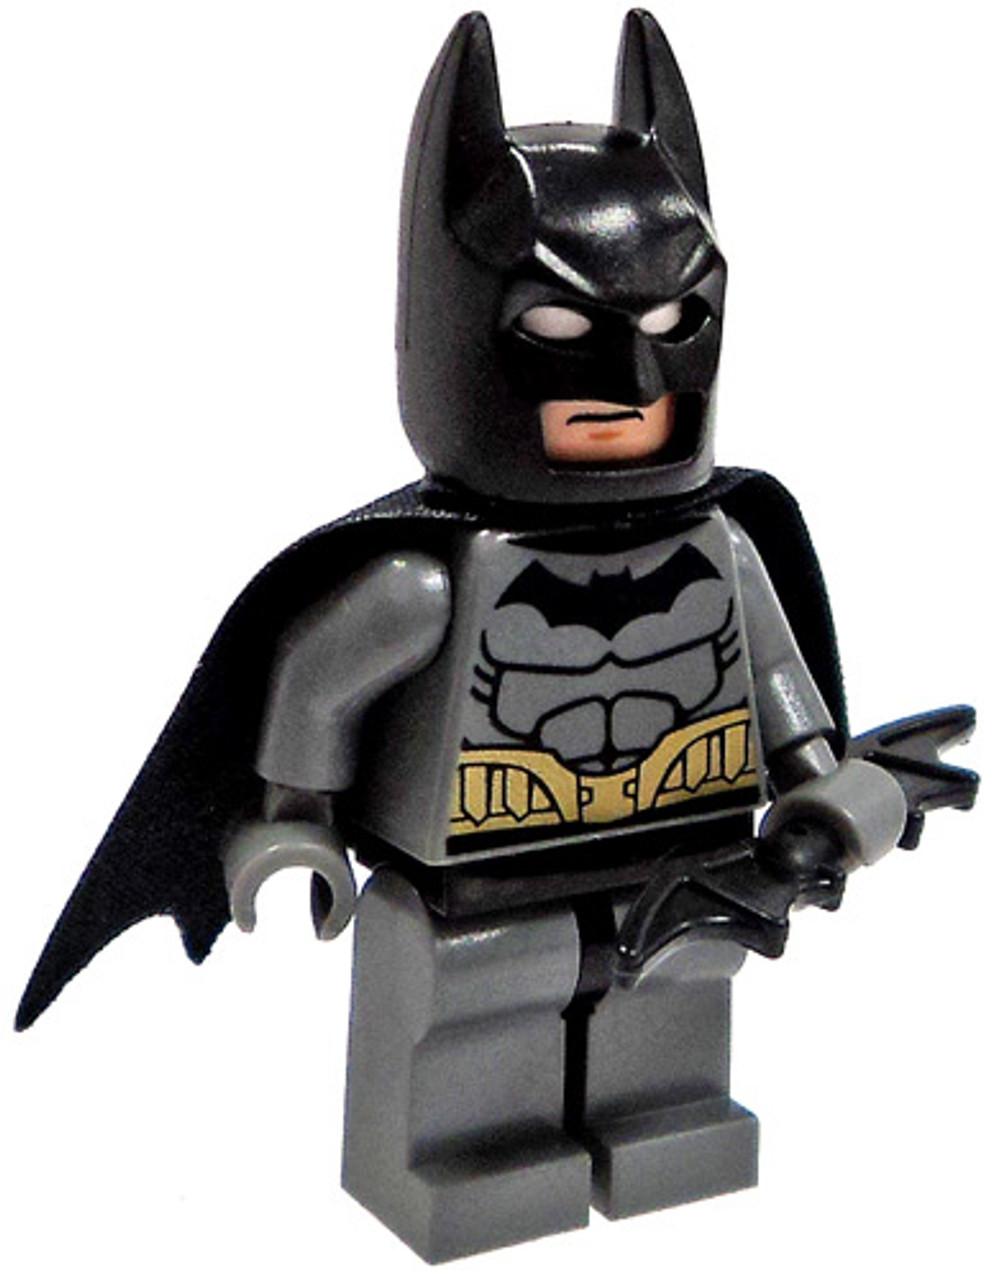 LEGO DC Universe Super Heroes Loose Batman Minifigure [Gray Loose]